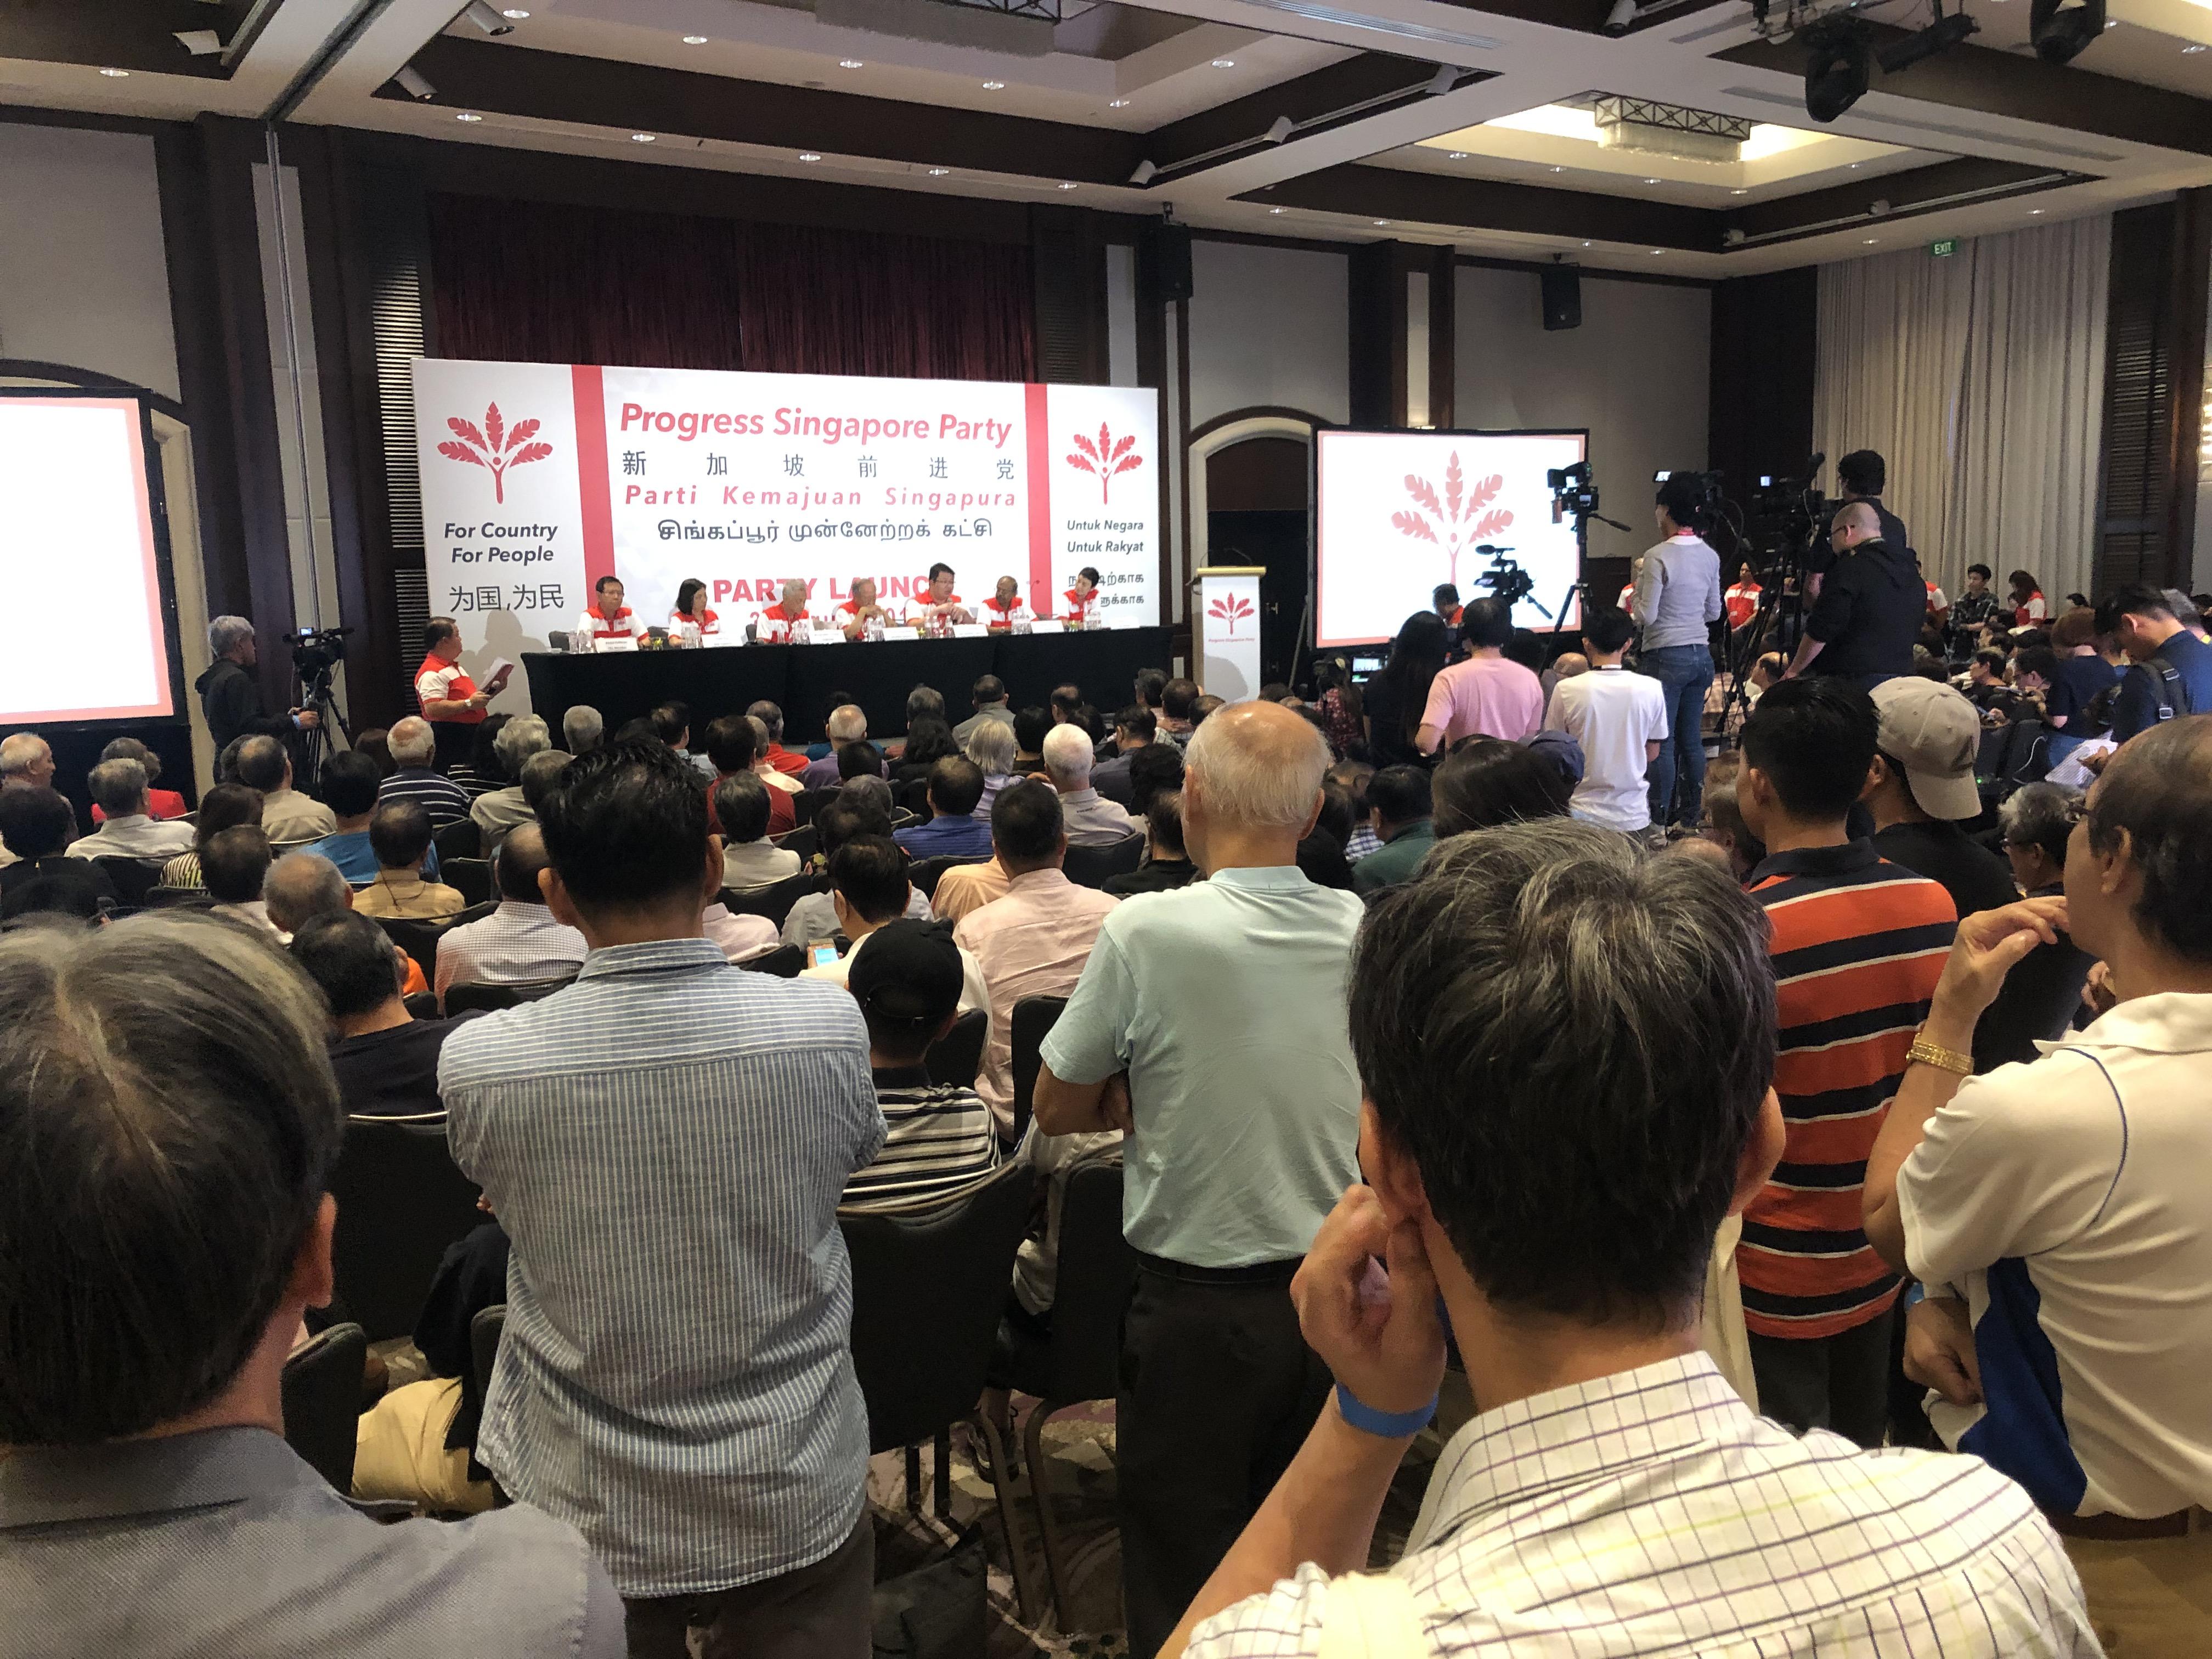 Progress Singapore Party - New Naratif